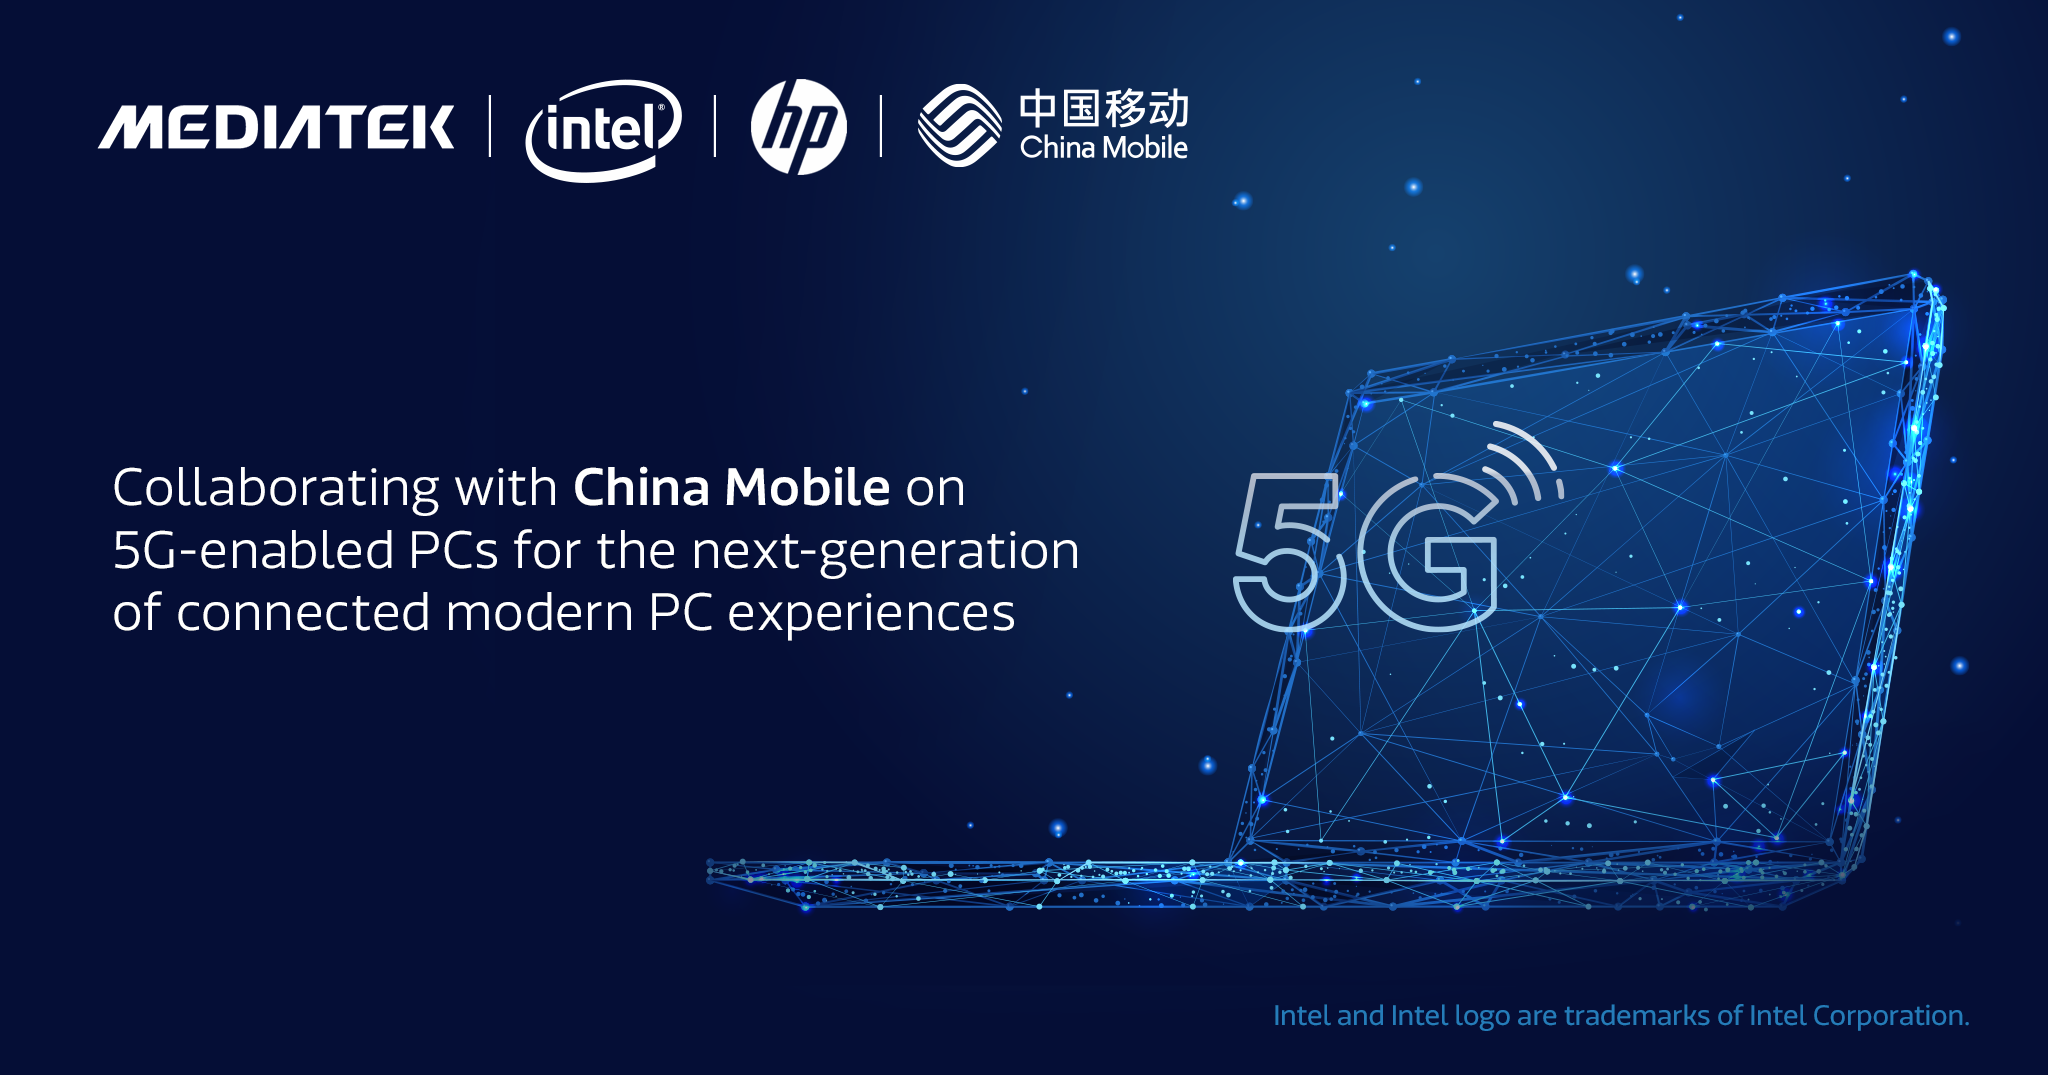 China Mobile Berkolaborasi Bersama Intel, HP dan MediaTek untuk Hadirkan Pengalaman